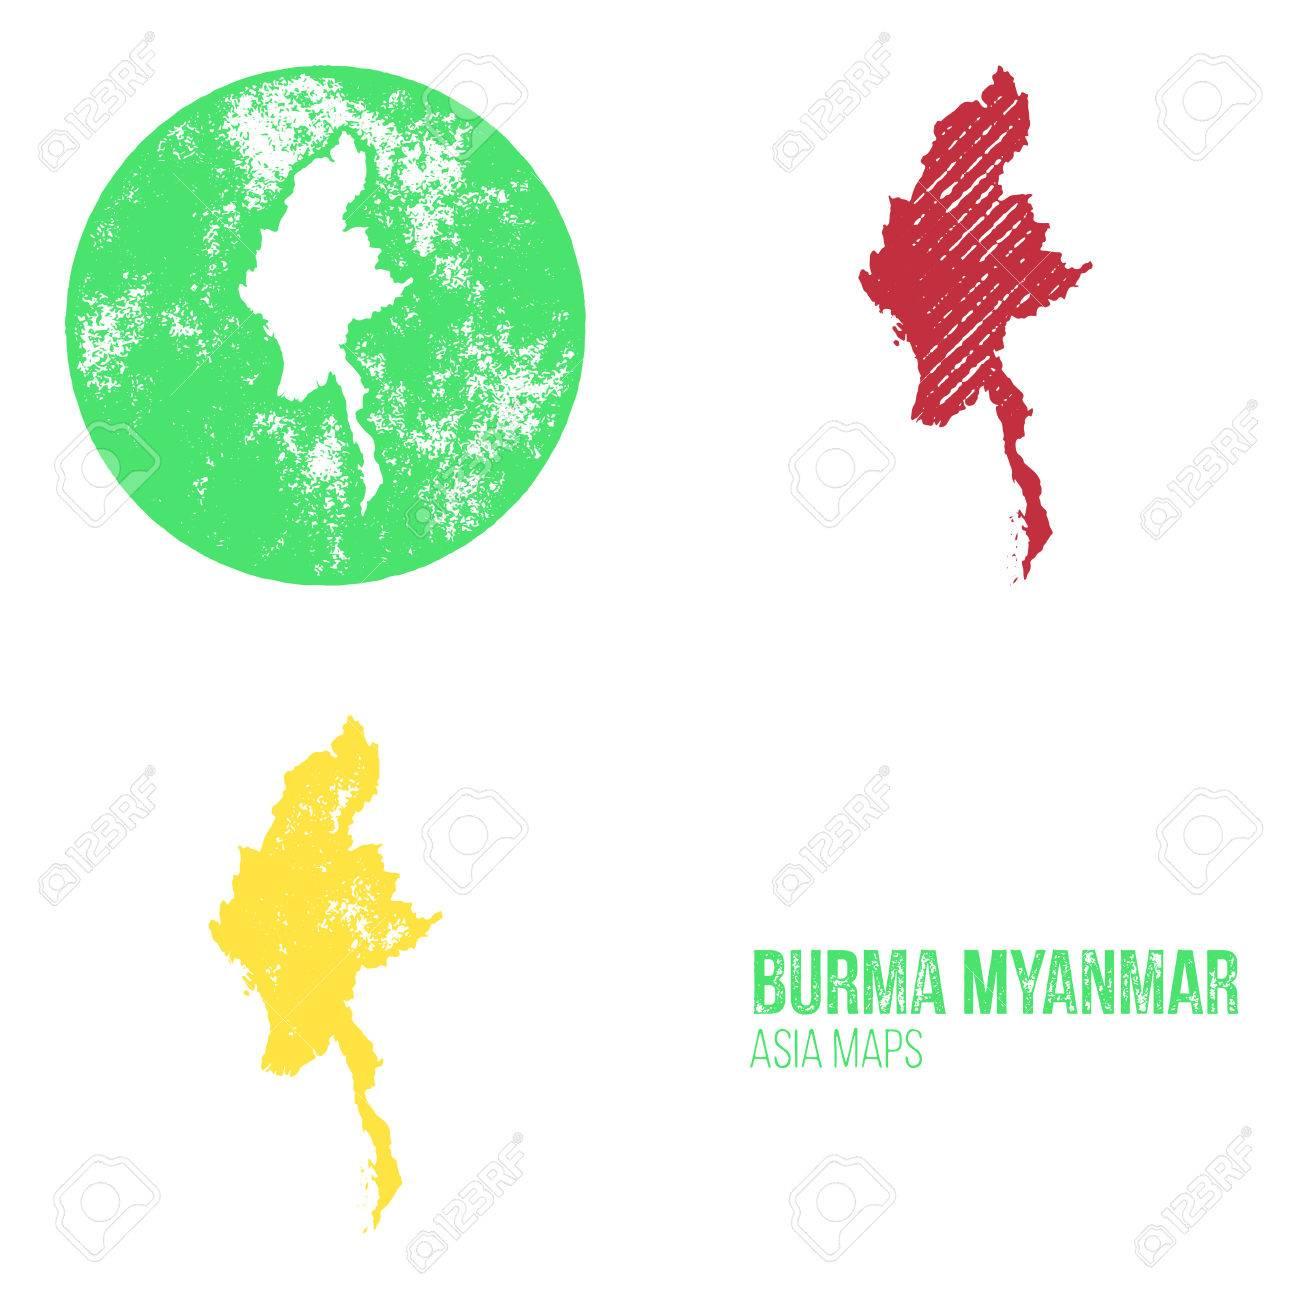 Myanmar On Map Of Asia.Burma Myanmar Grunge Retro Maps Asia Three Silhouettes Burma